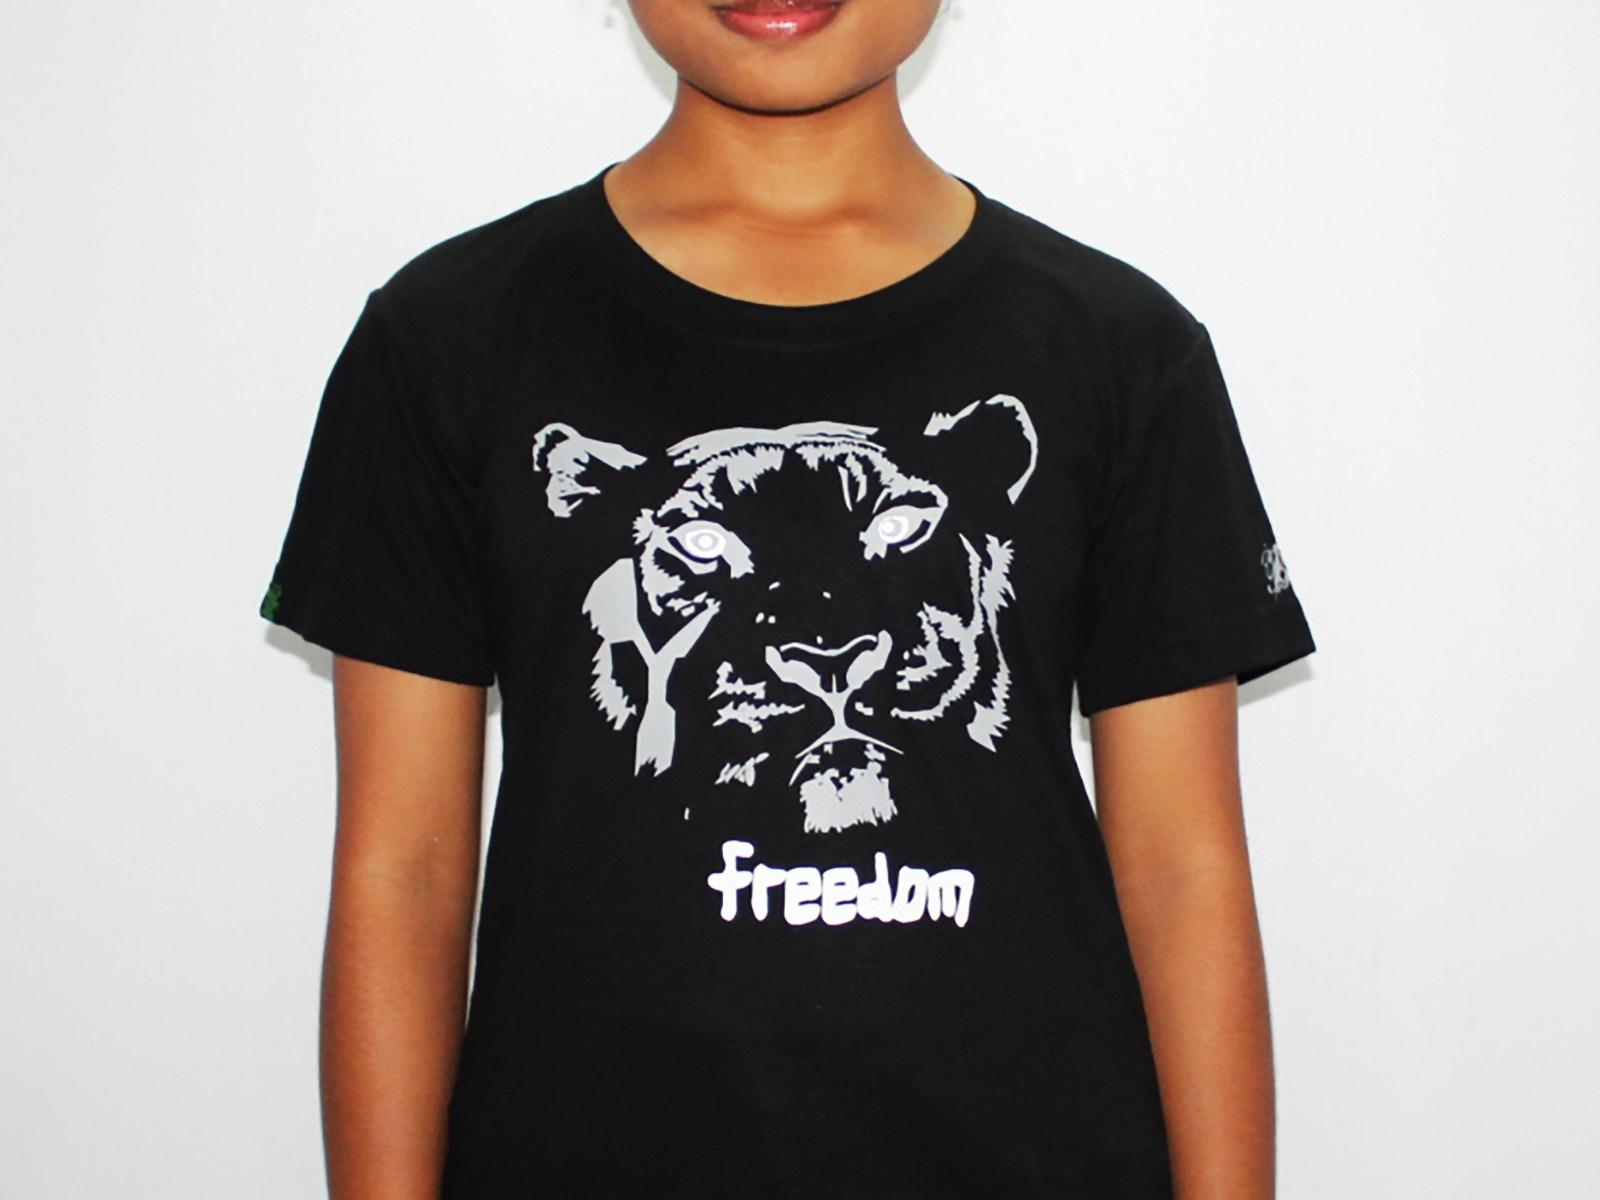 Ladies Bamboo T-shirts by Baki Clothing Company